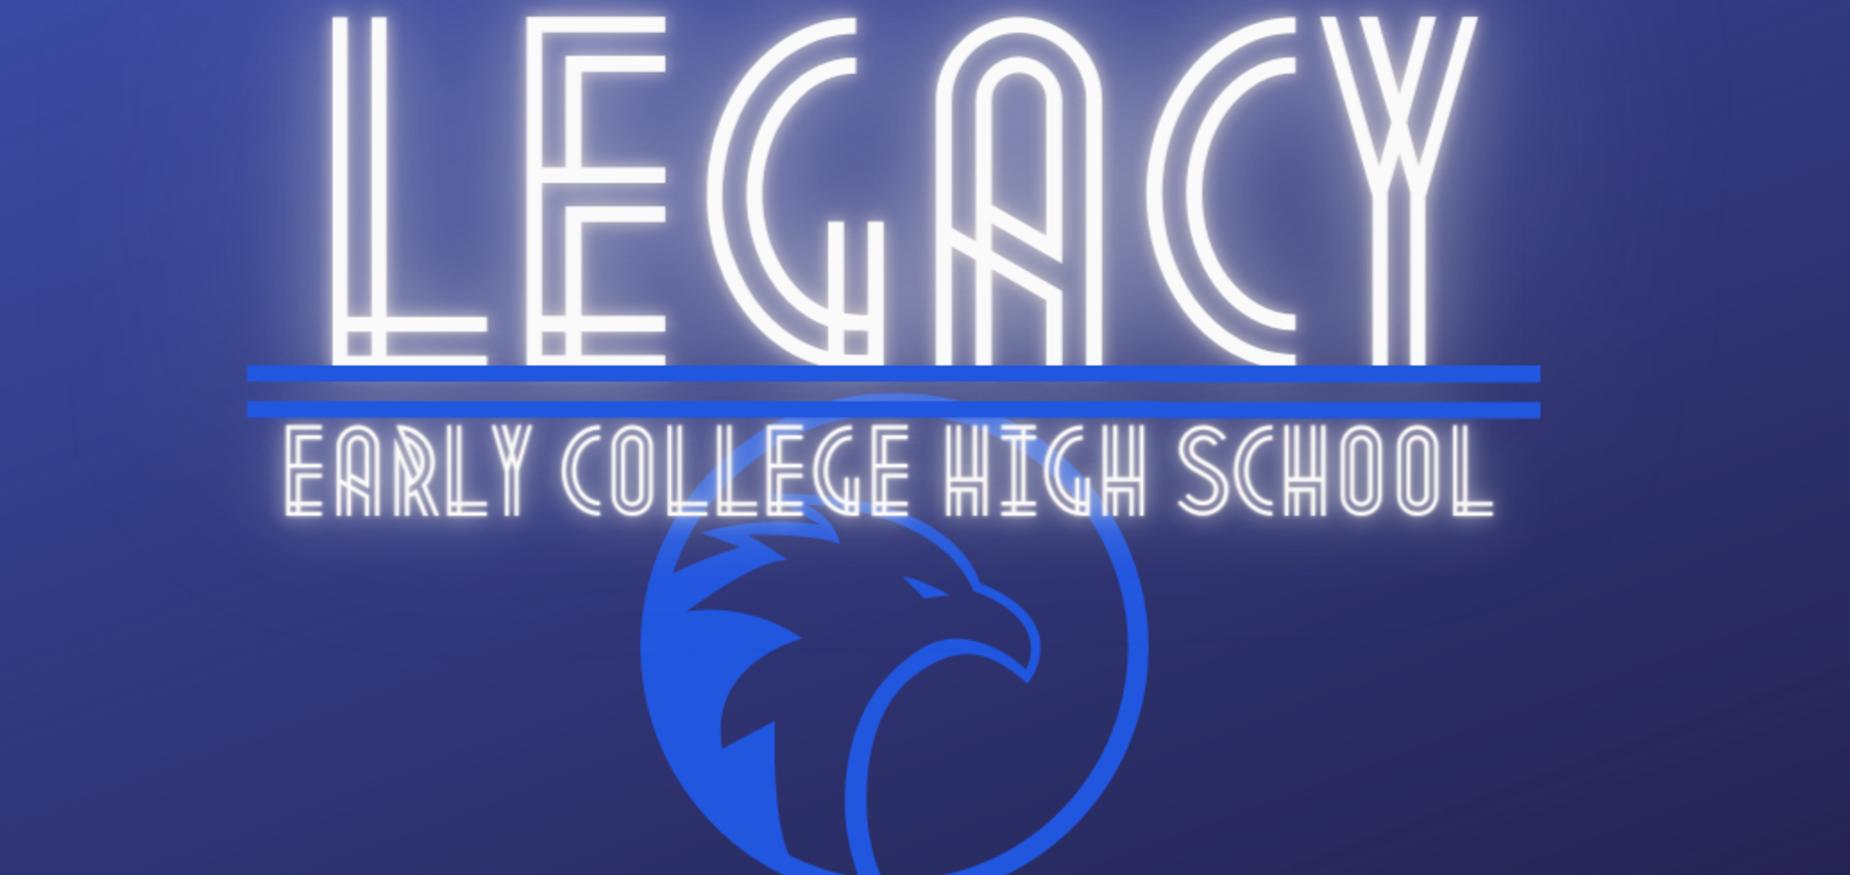 Legacy Banner